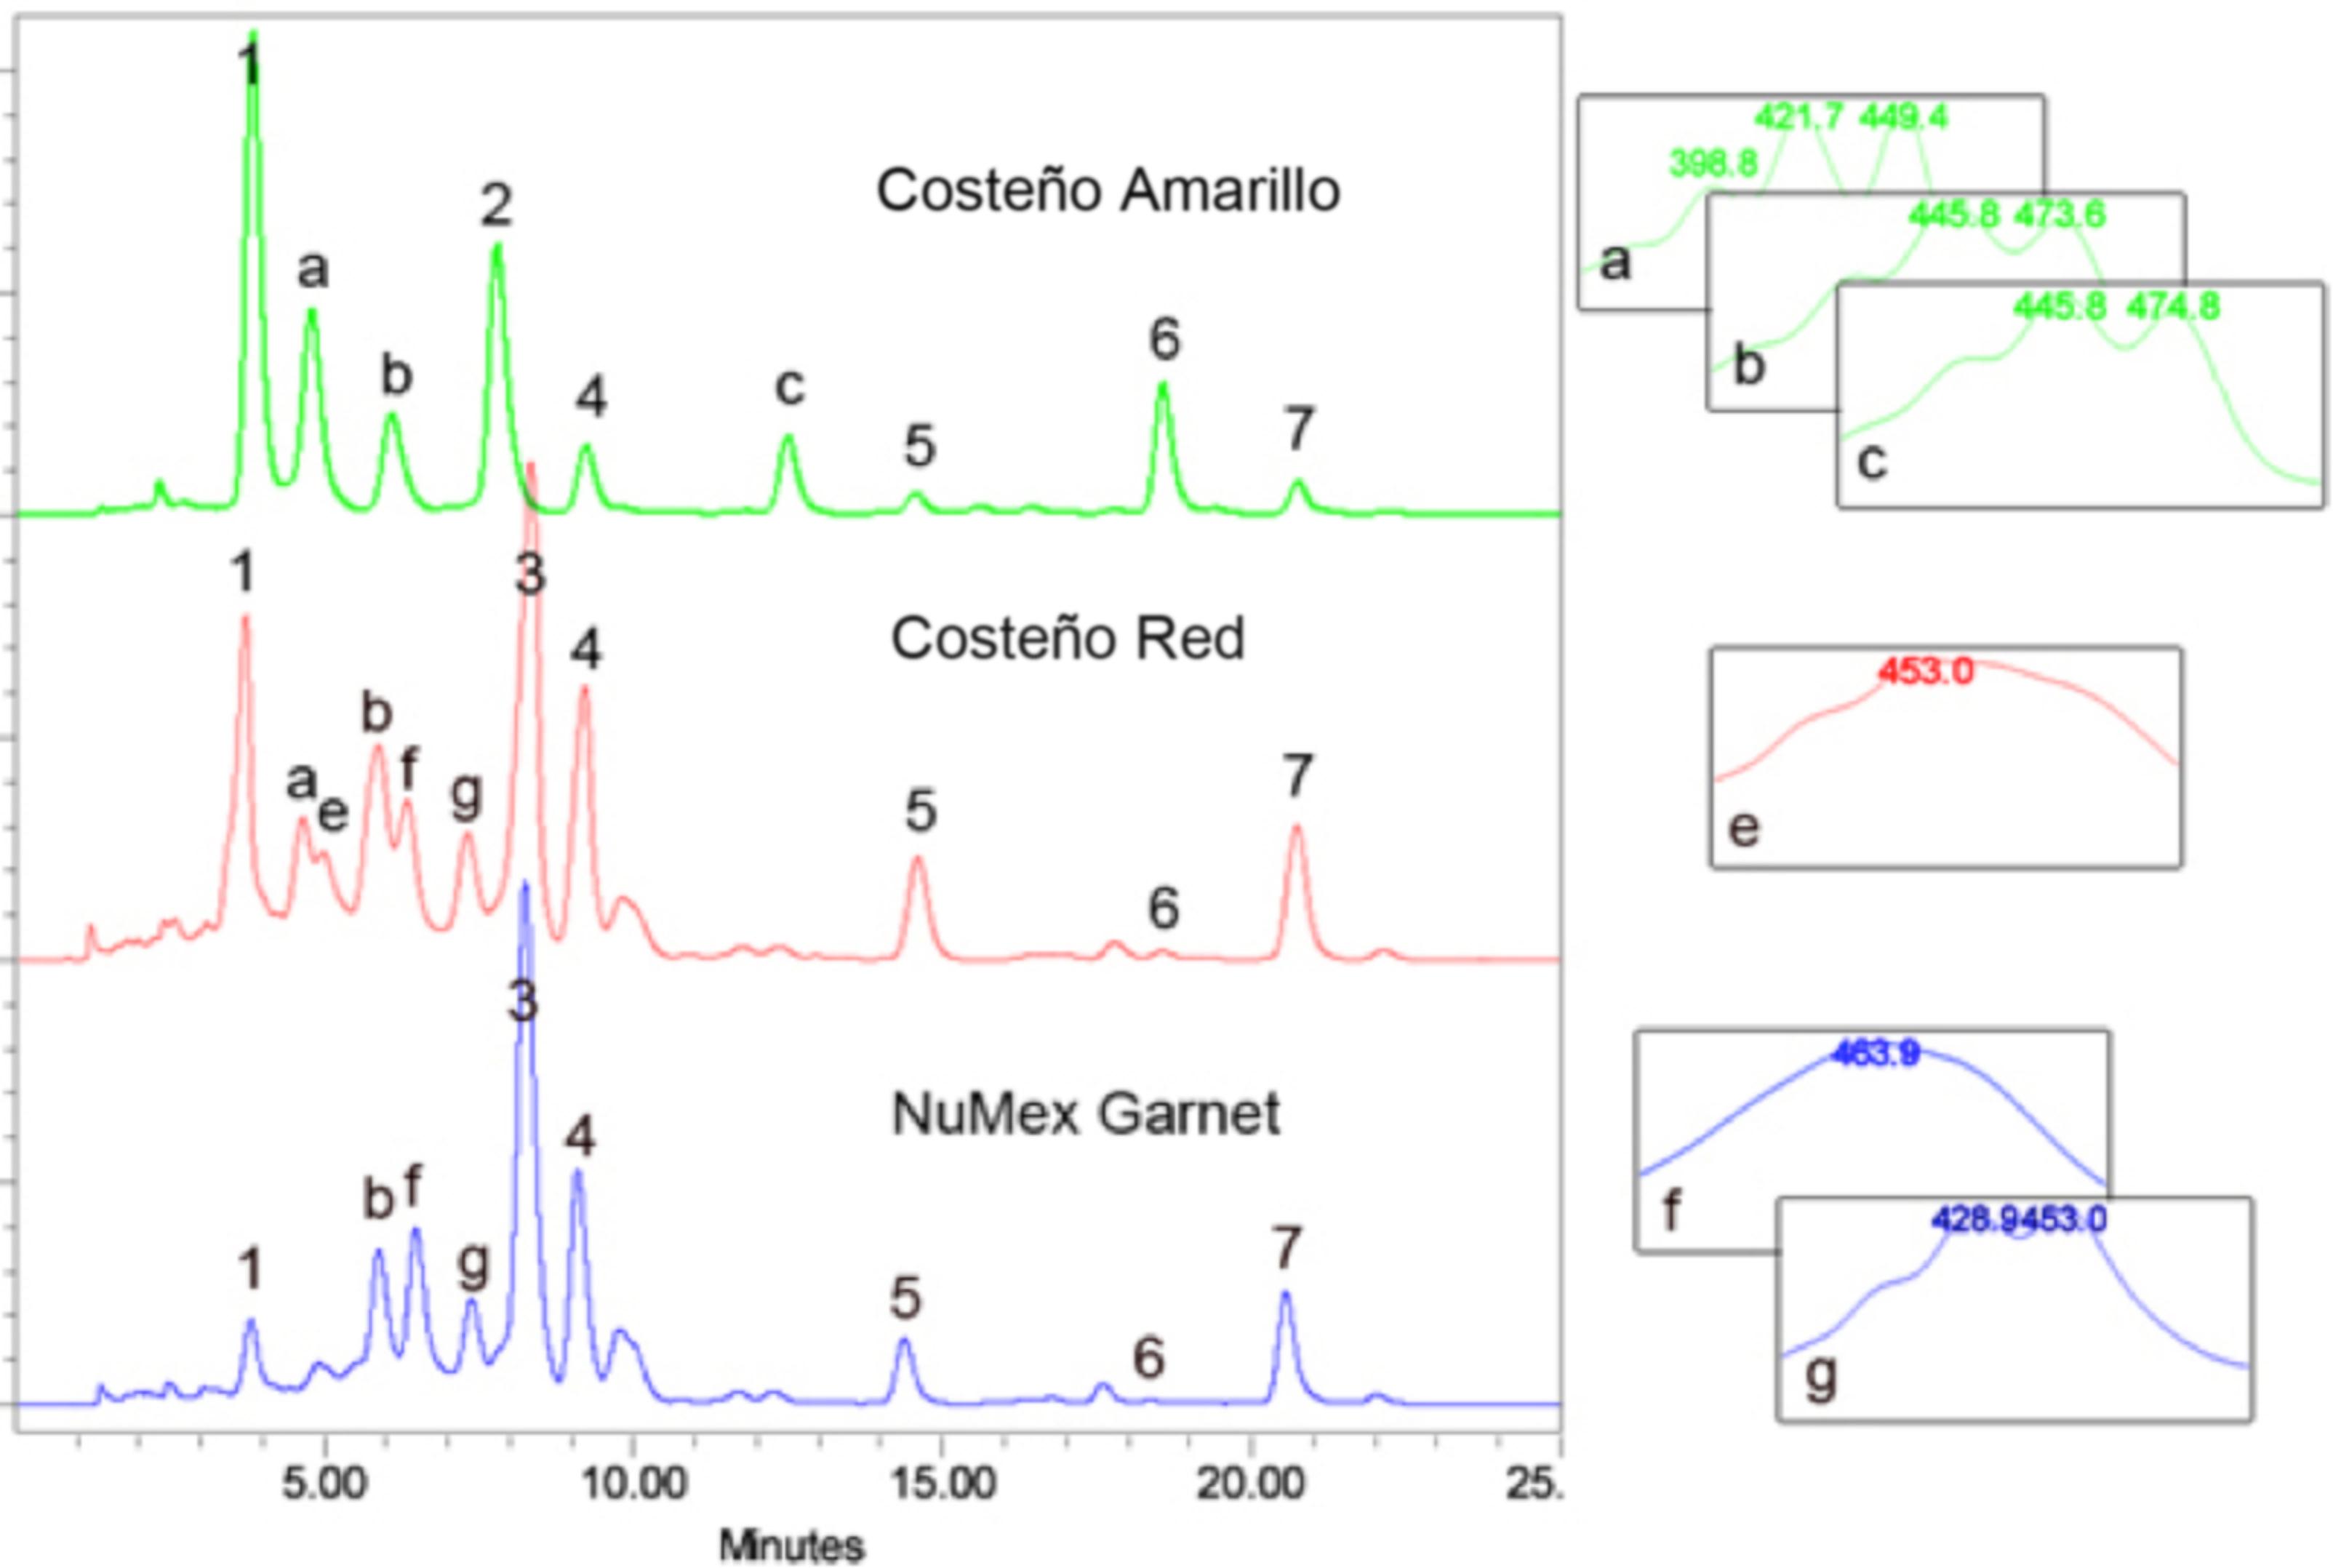 Carotenoid Extraction and Quantification from Capsicum